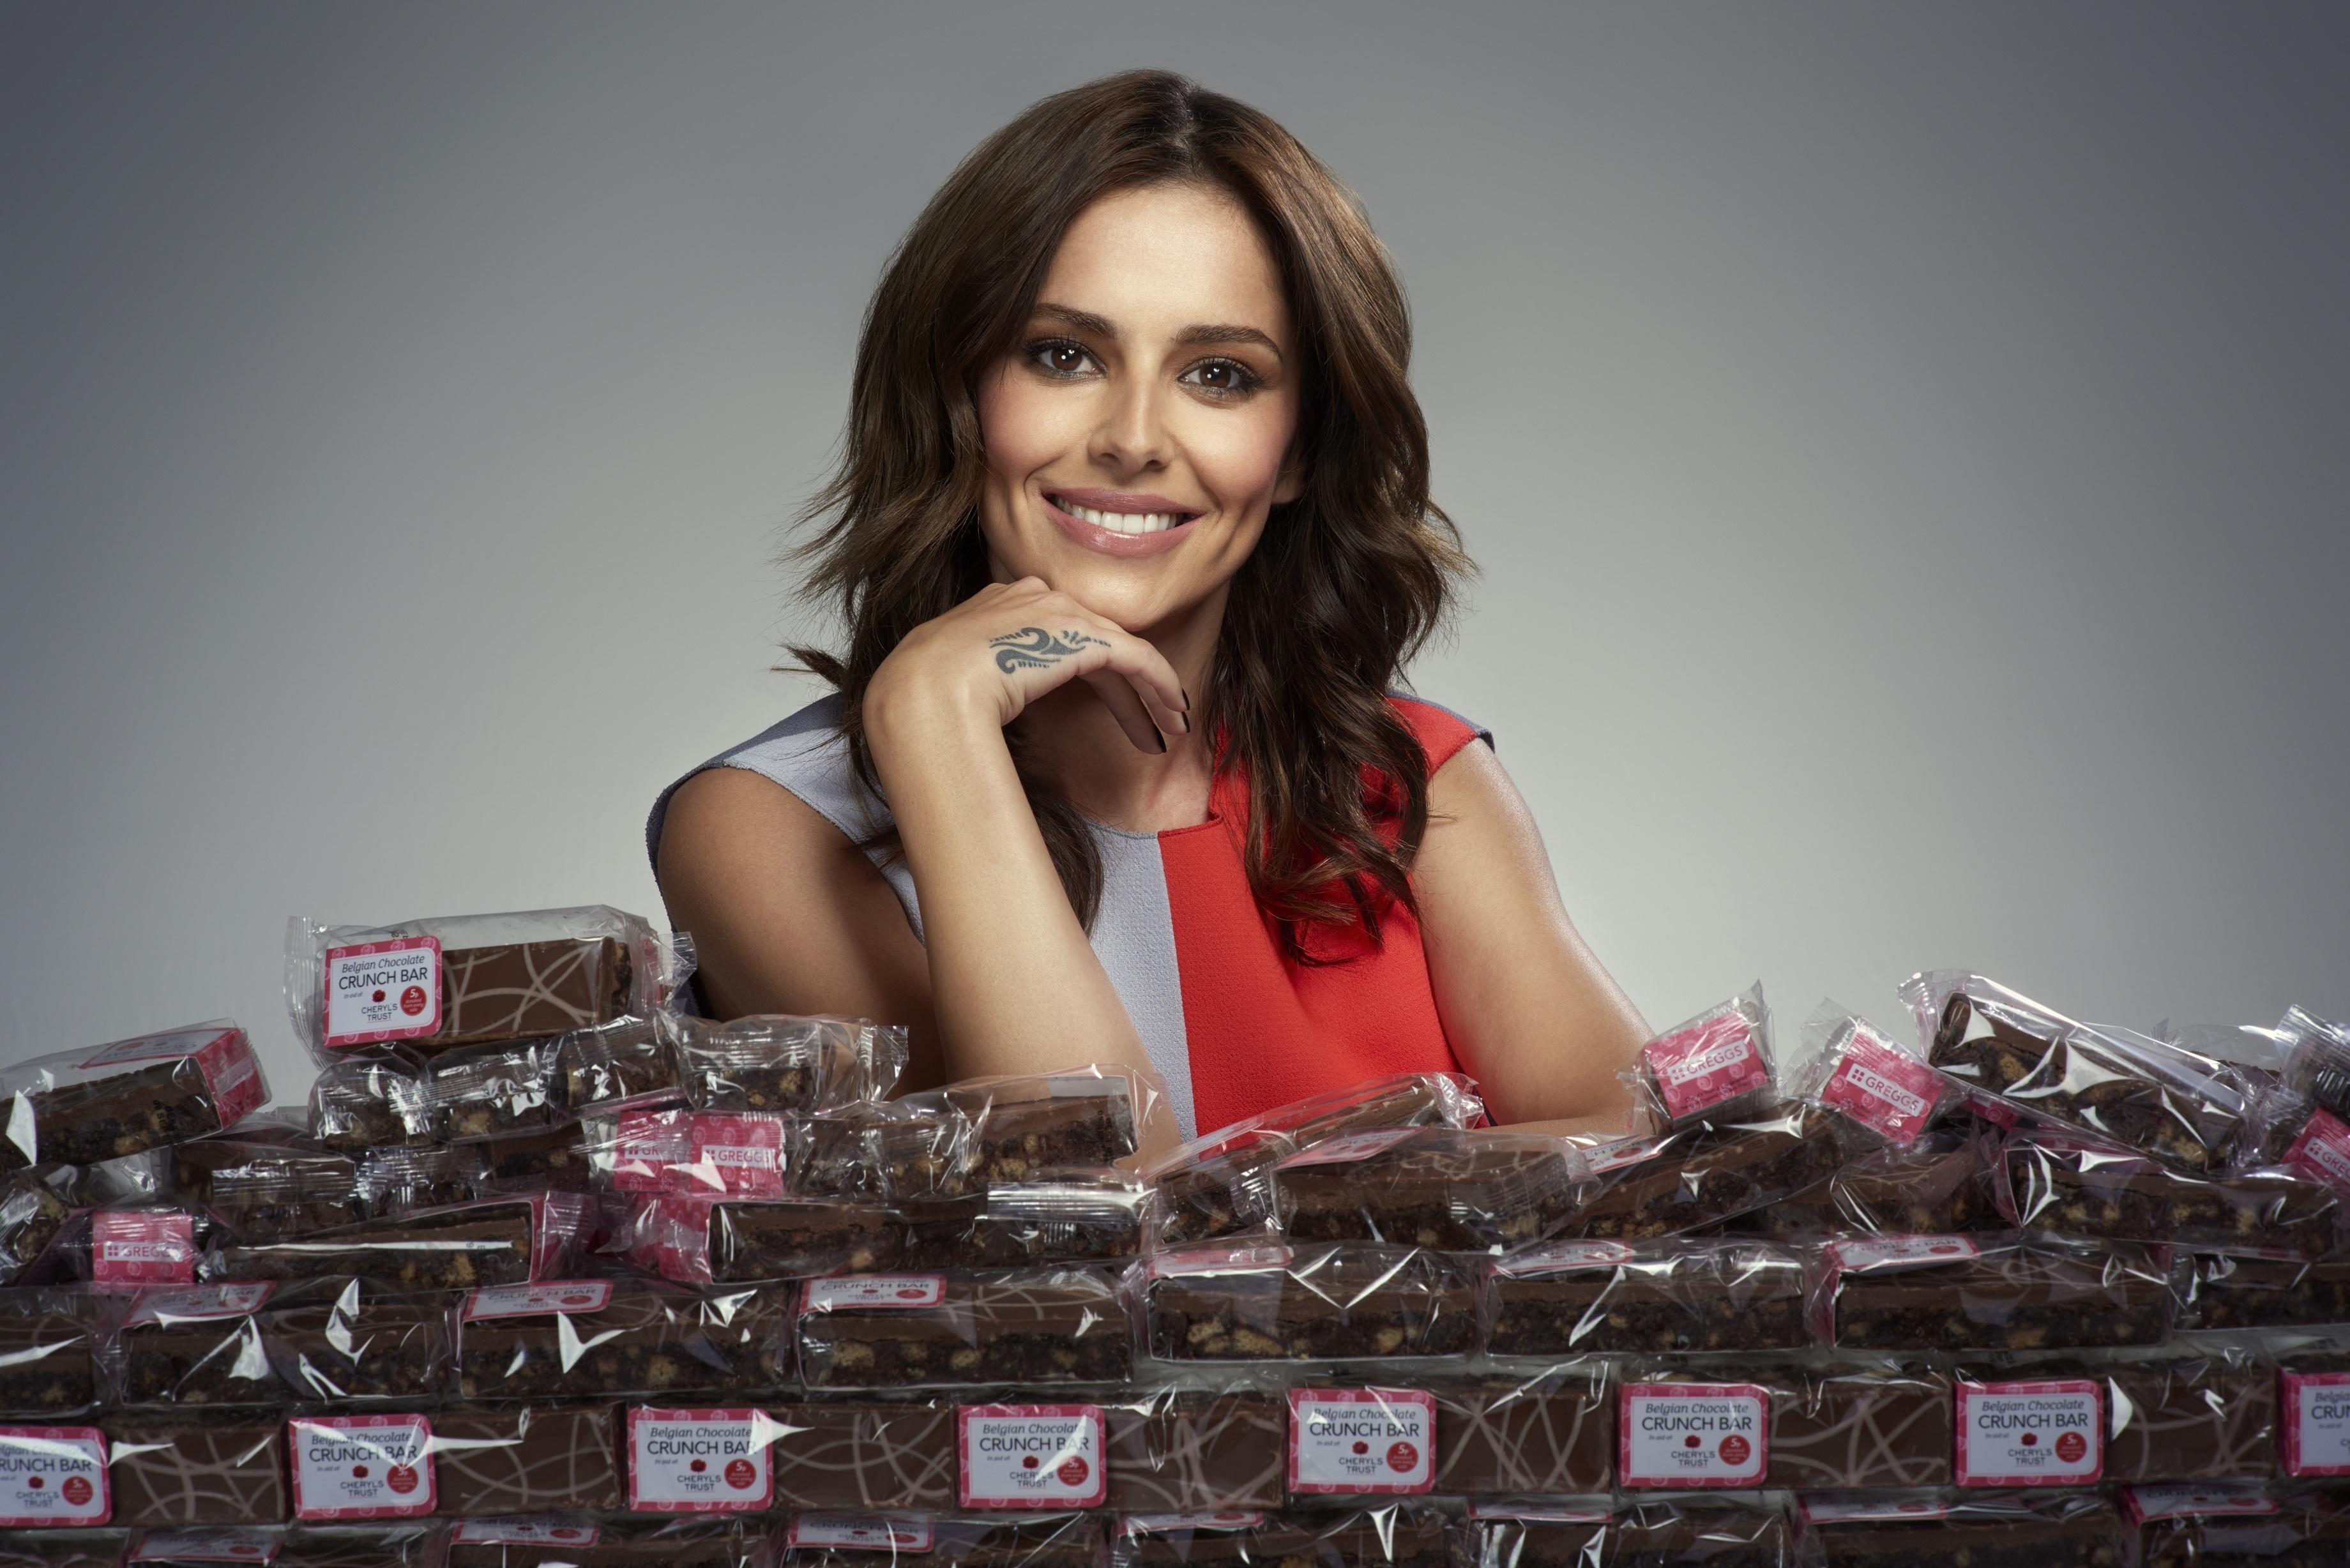 Cheryl Fernandez-Versini throws her weight behind Greggs' charity chocolate bar campaign